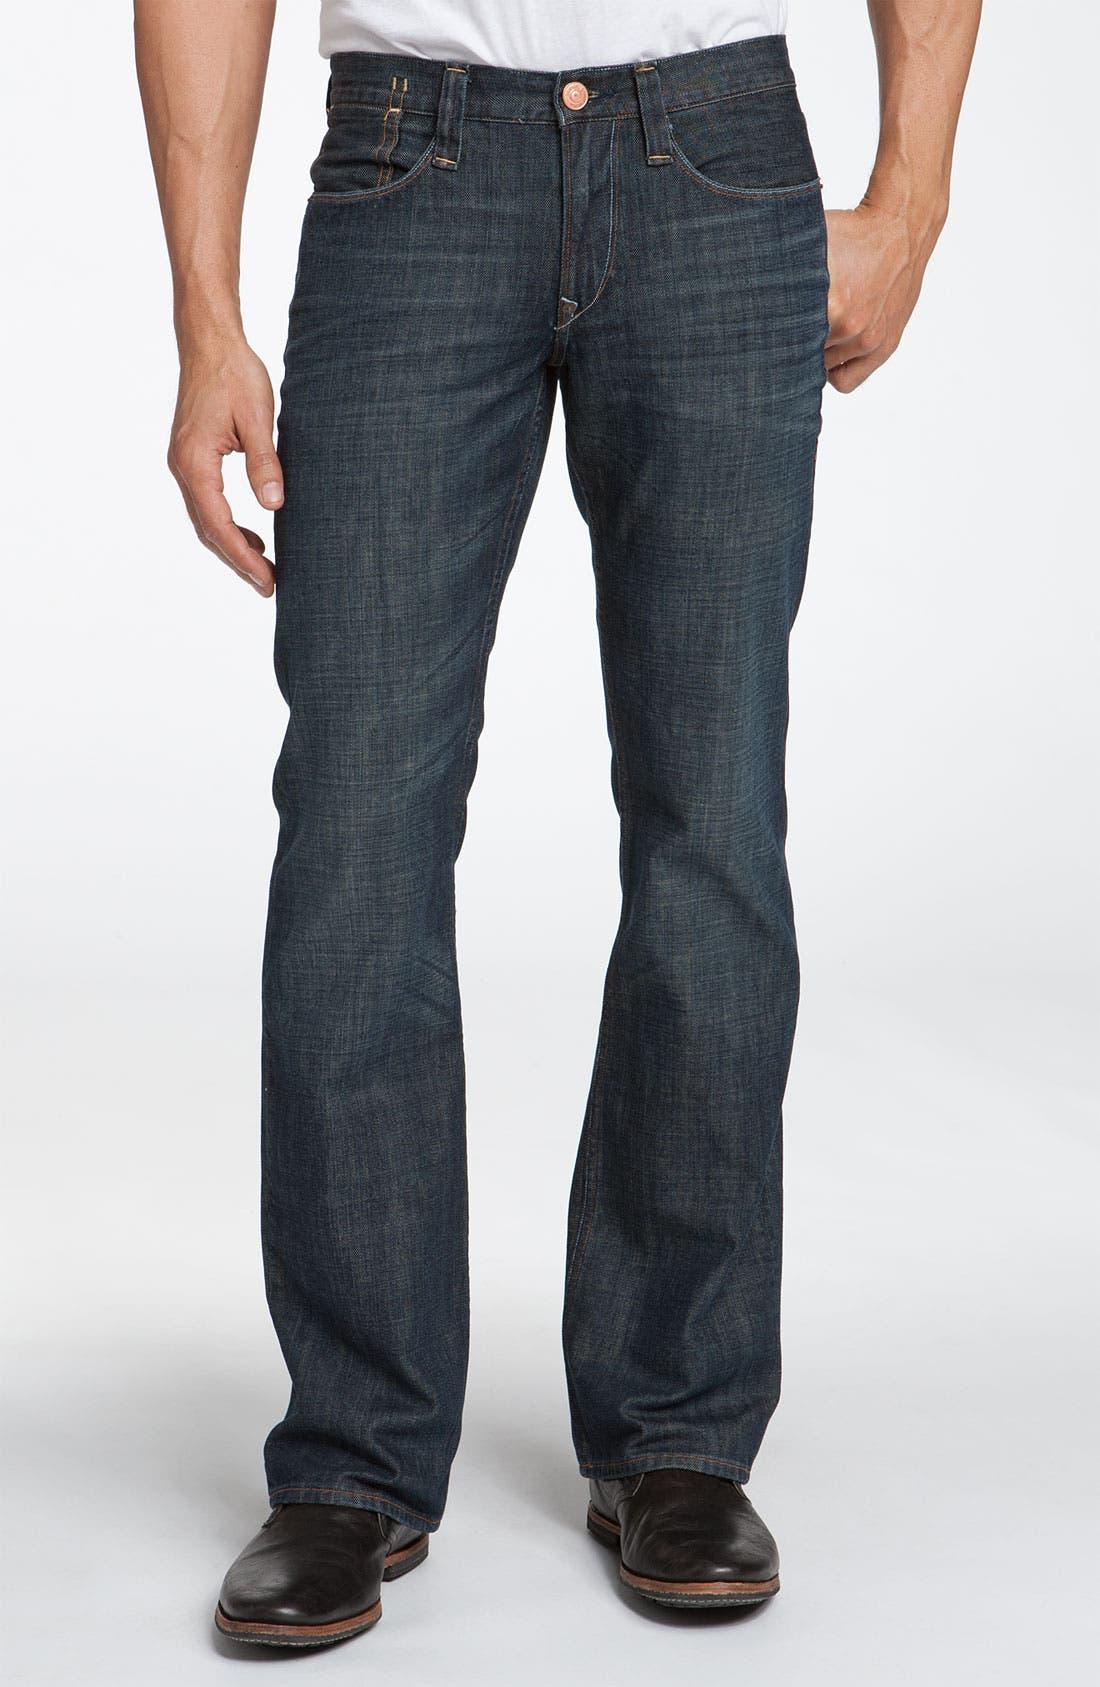 Alternate Image 2  - Earnest Sewn 'Hutch' Bootcut Jeans (Maz Dark)